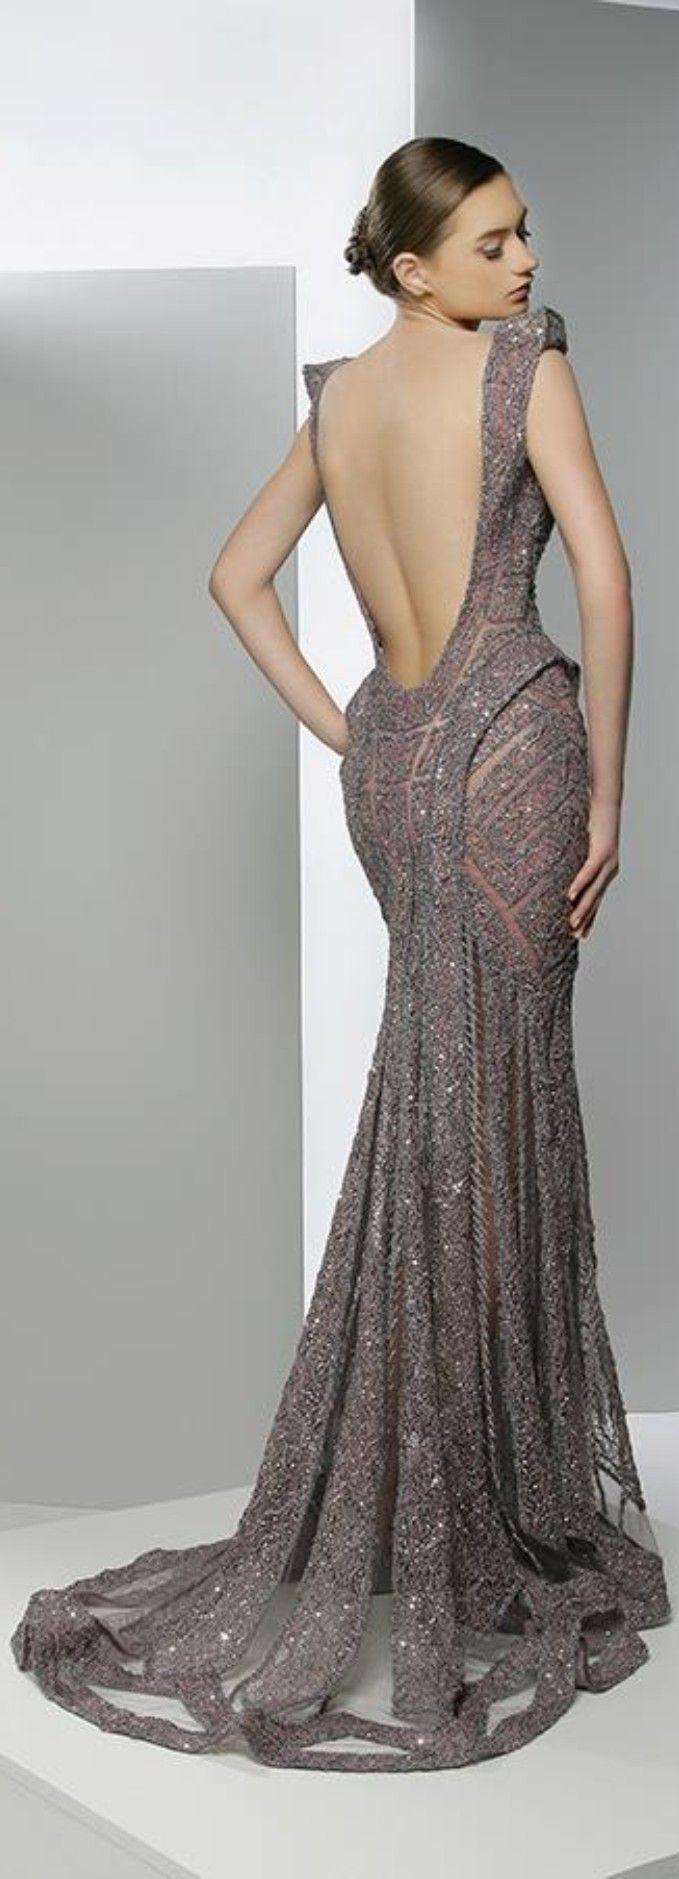 Ziad Nakad Haute Couture  <3